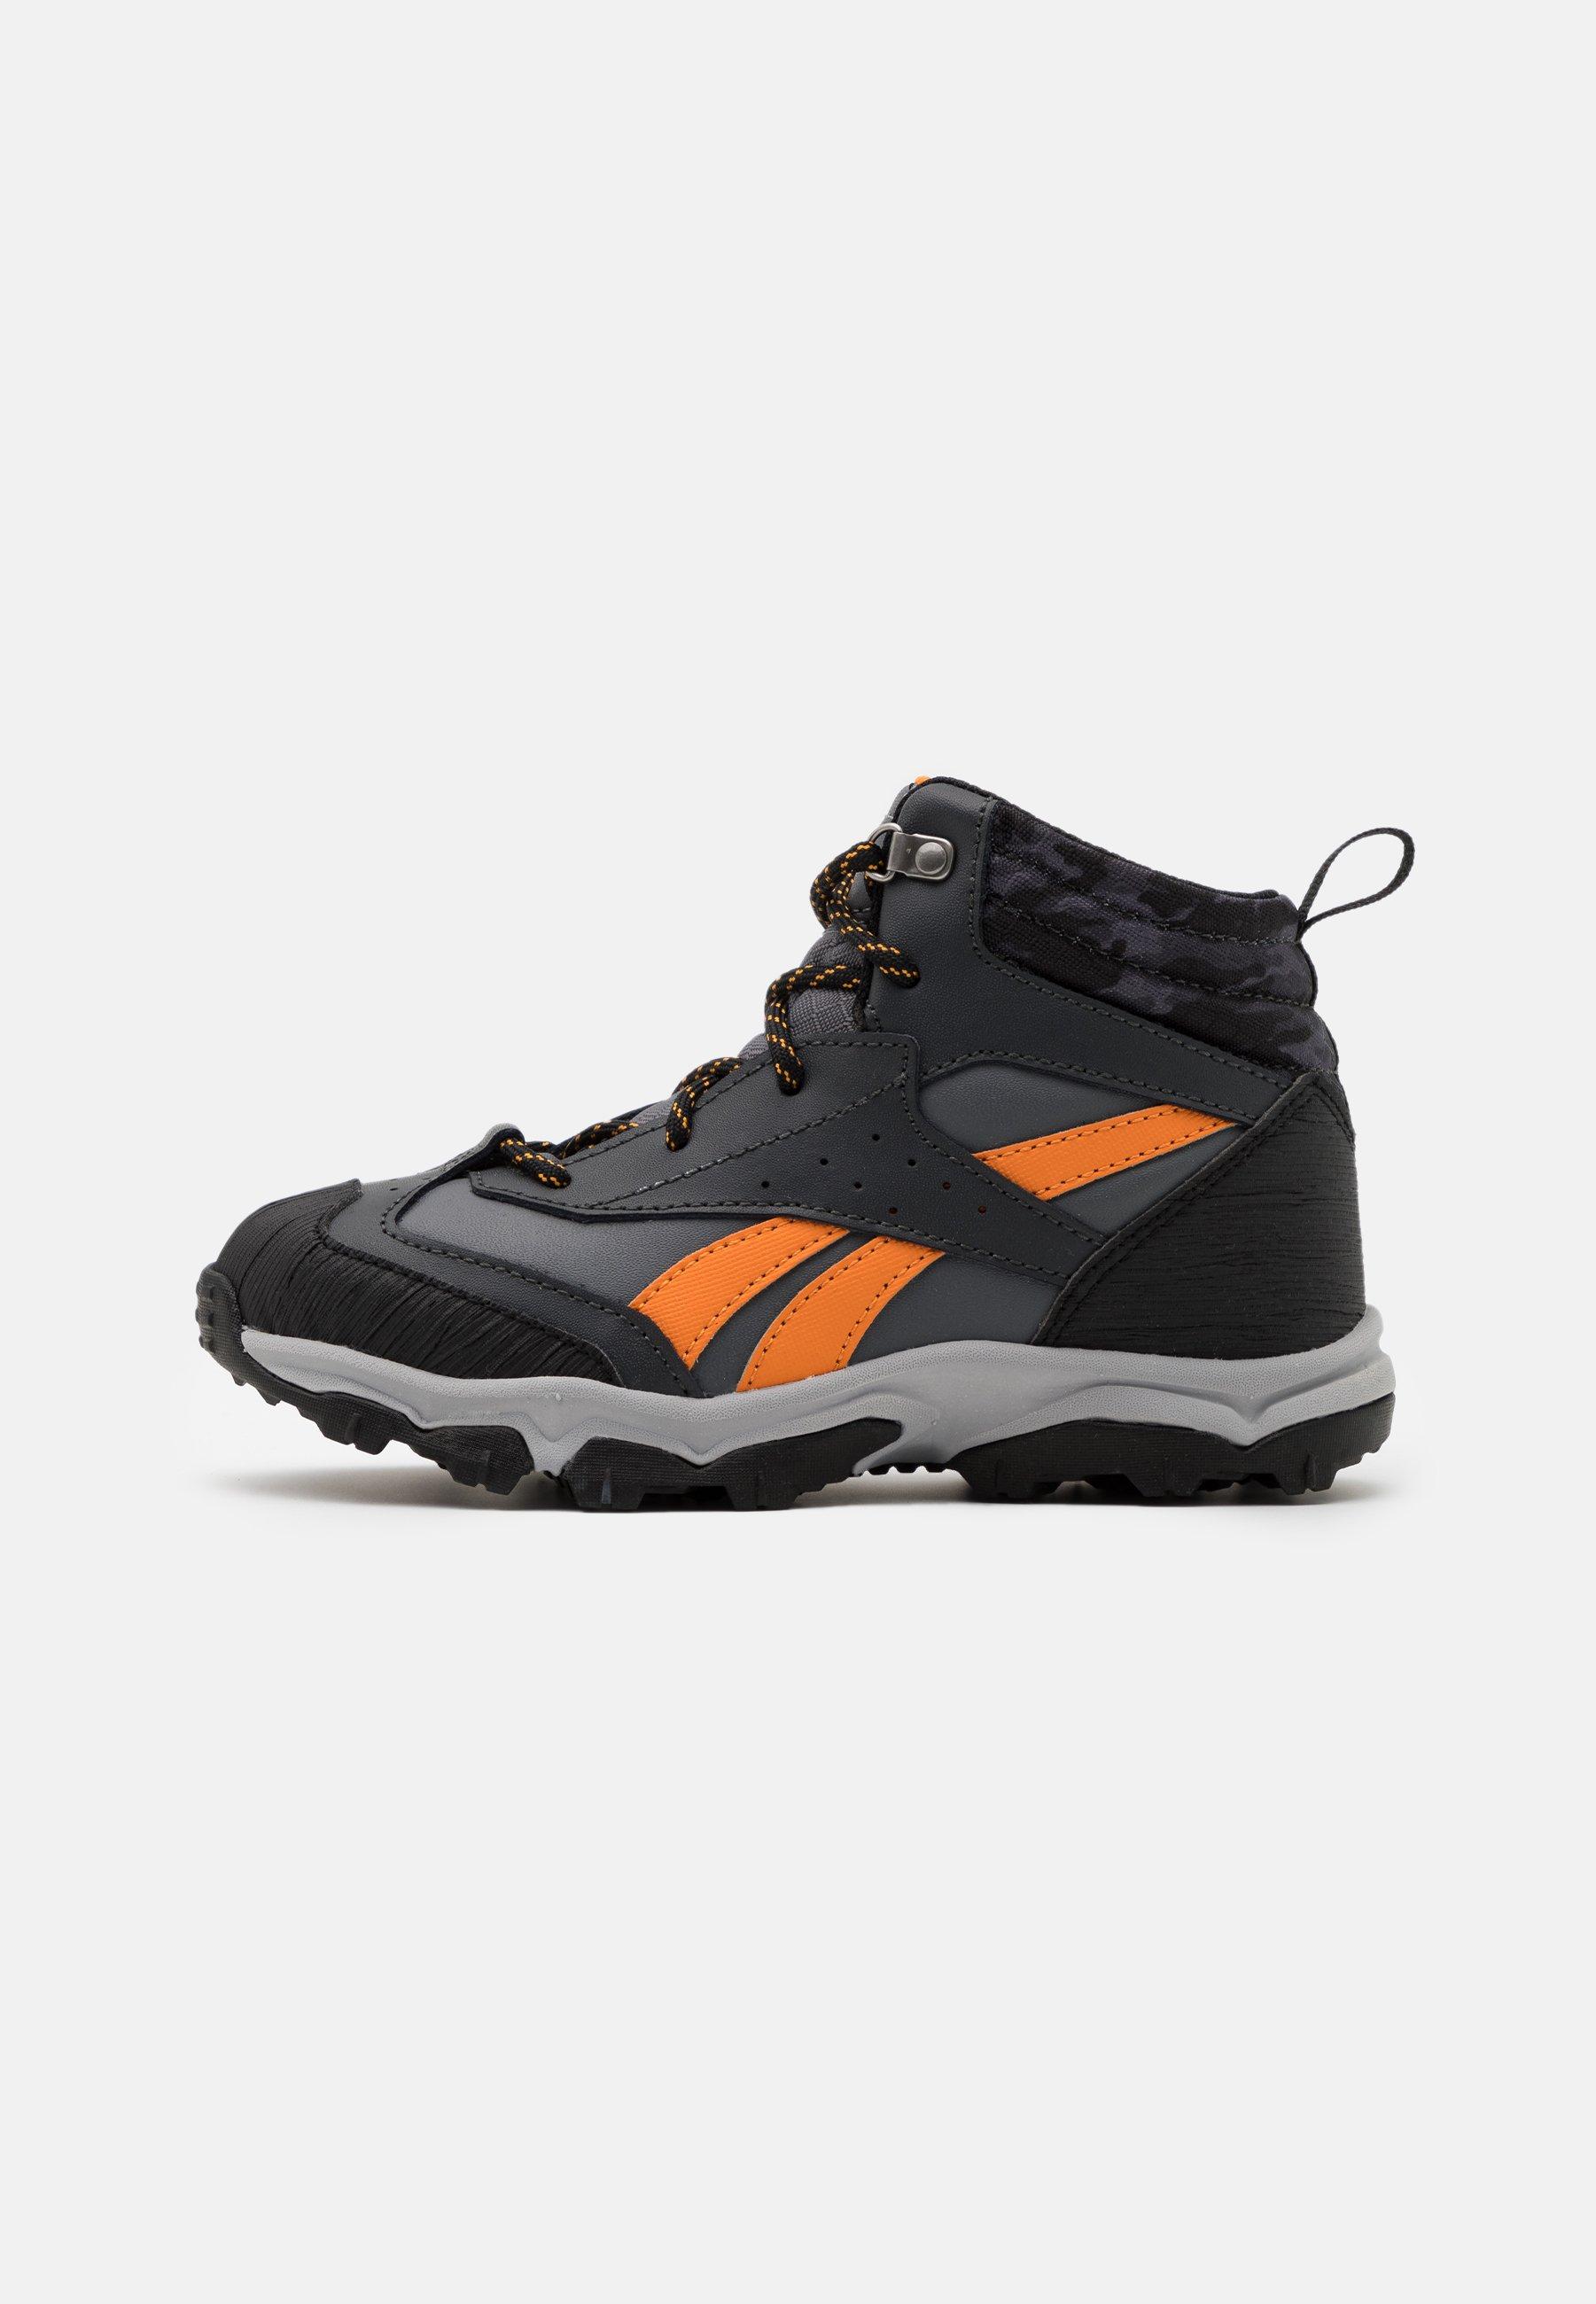 salomon trail running shoes wide fit zalando